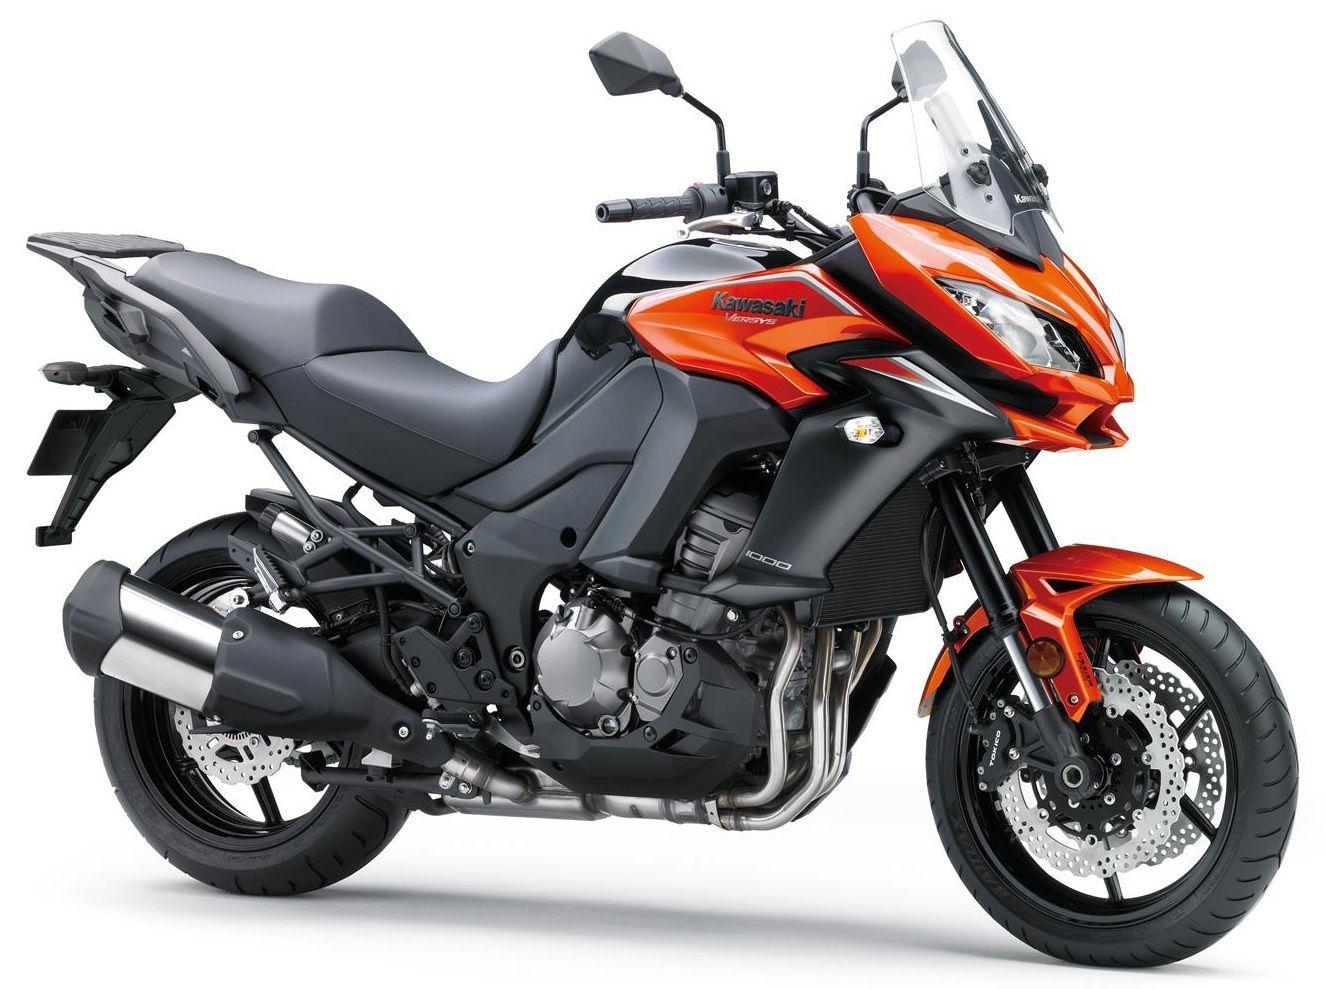 Motocicleta Kawasaki Versys 1000 ABS 2017 Versys